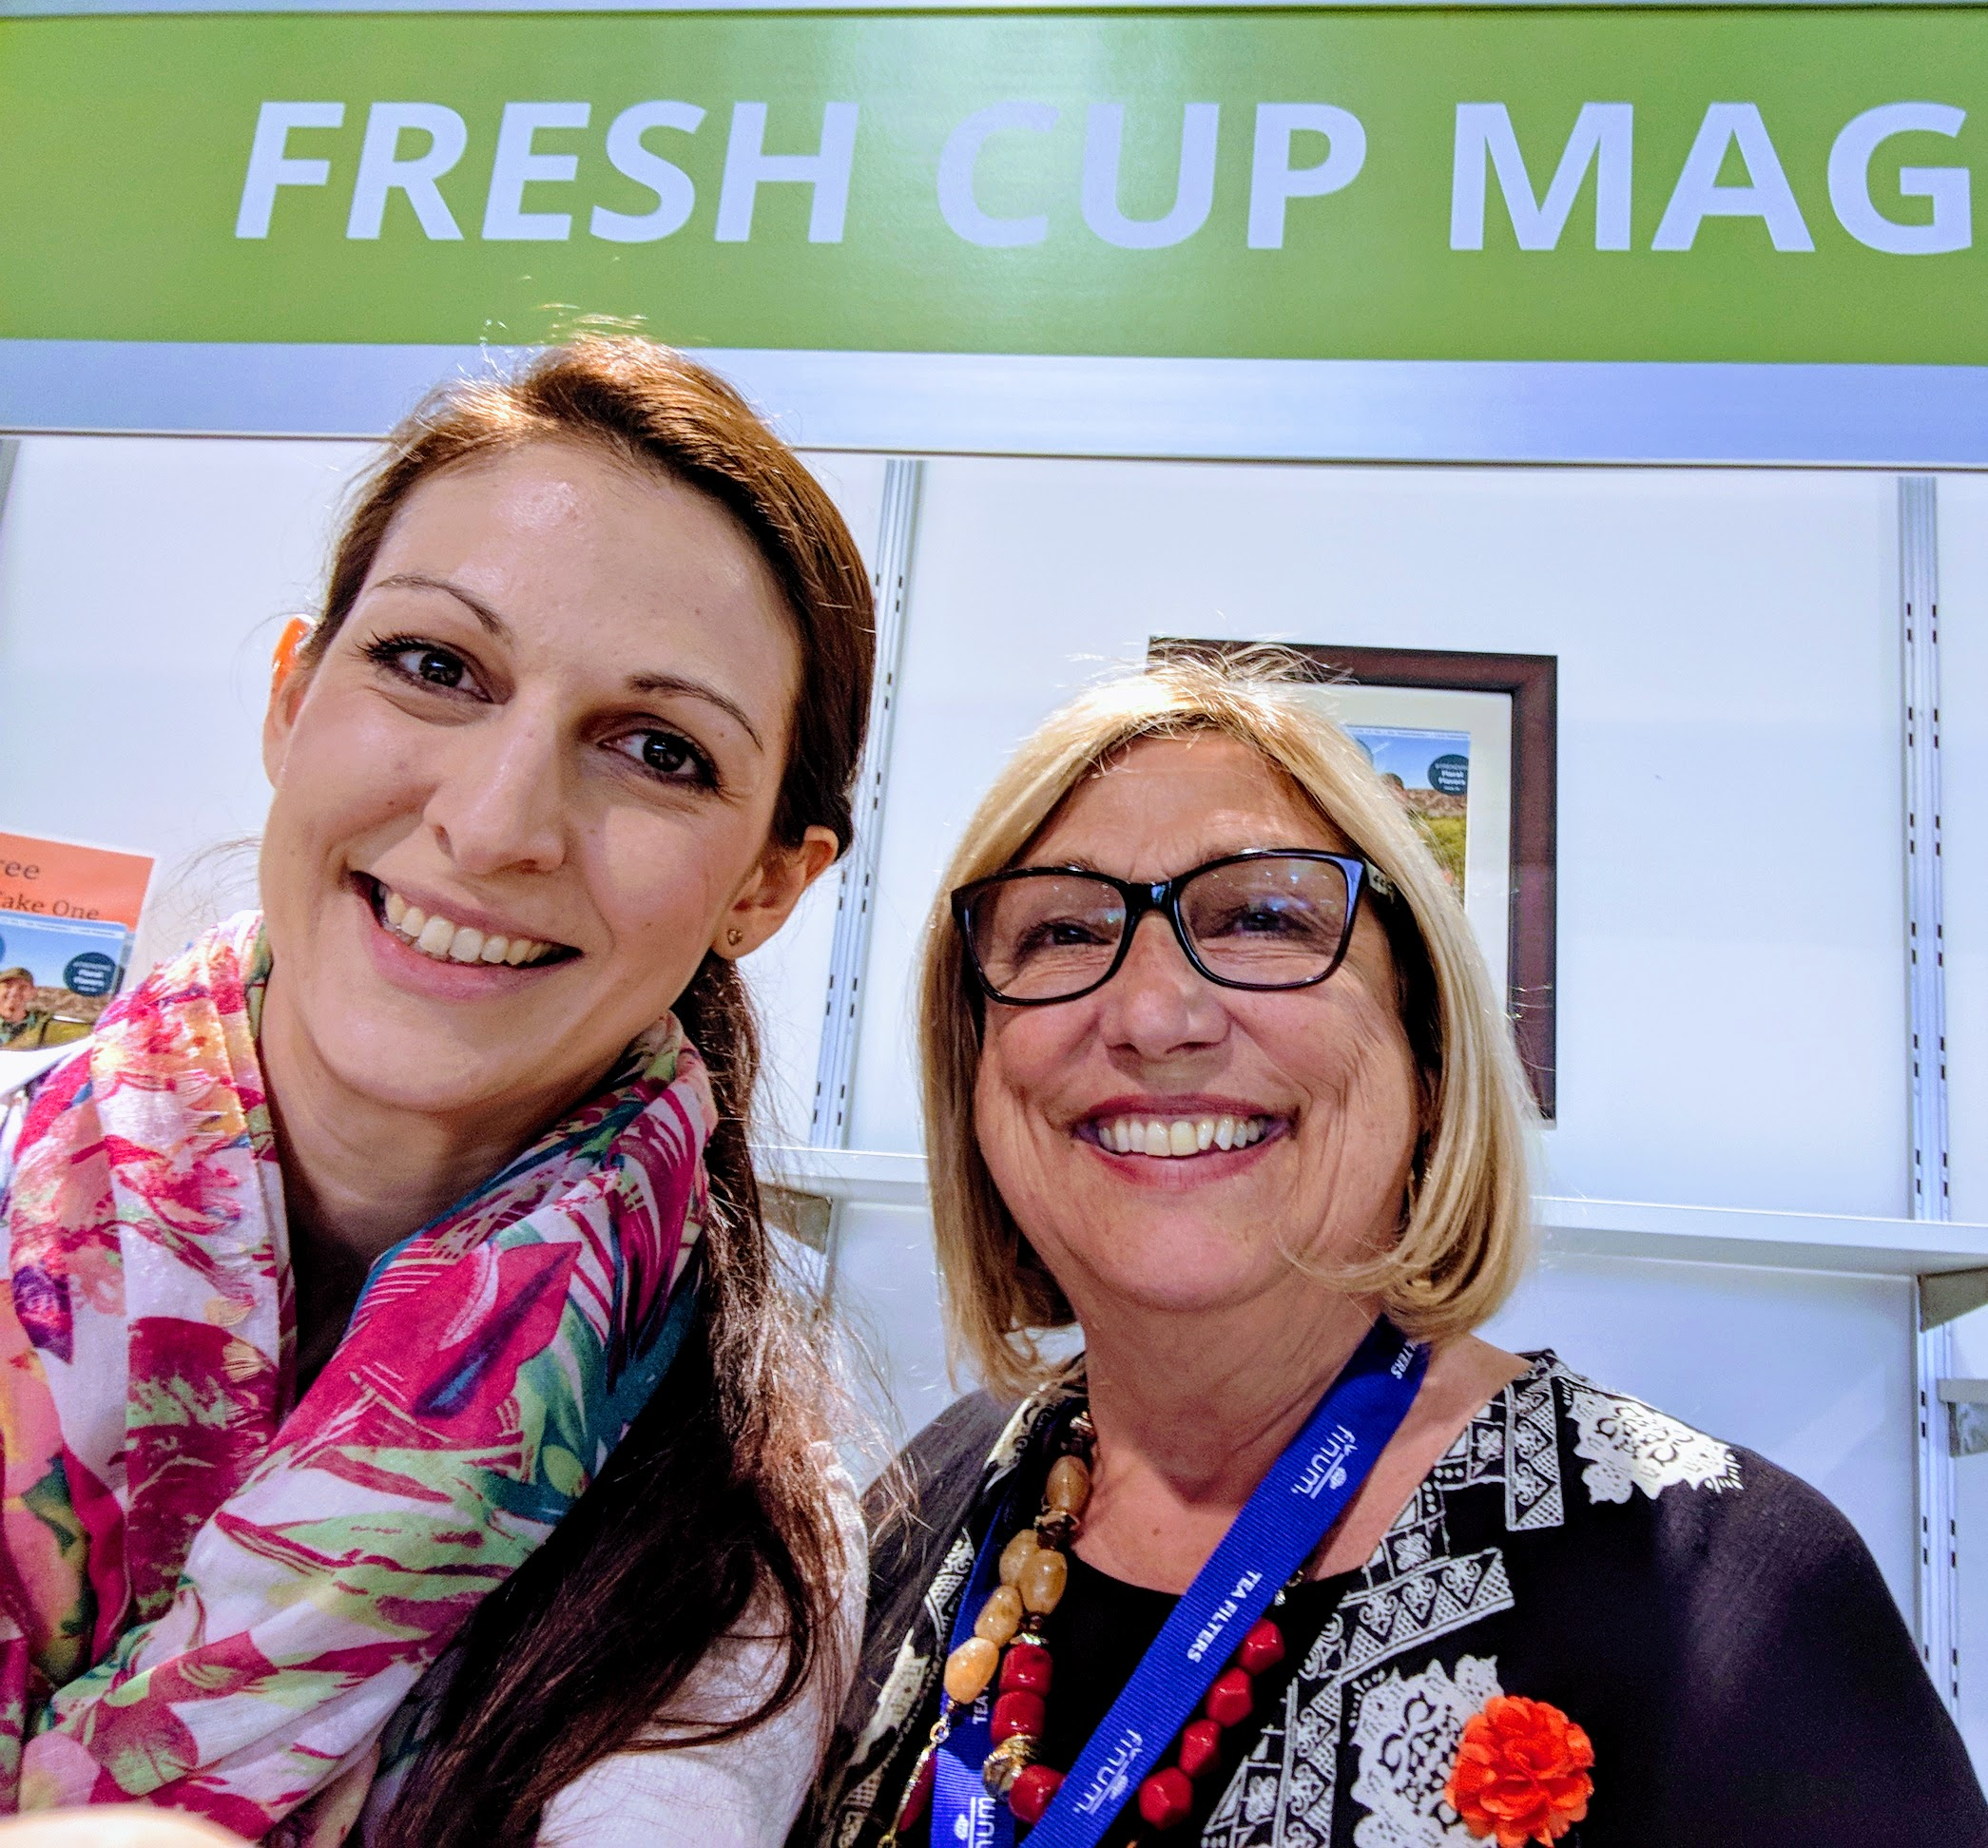 I had the pleasure to meet Fresh Cup Magazine Publisher Jan Weigel.